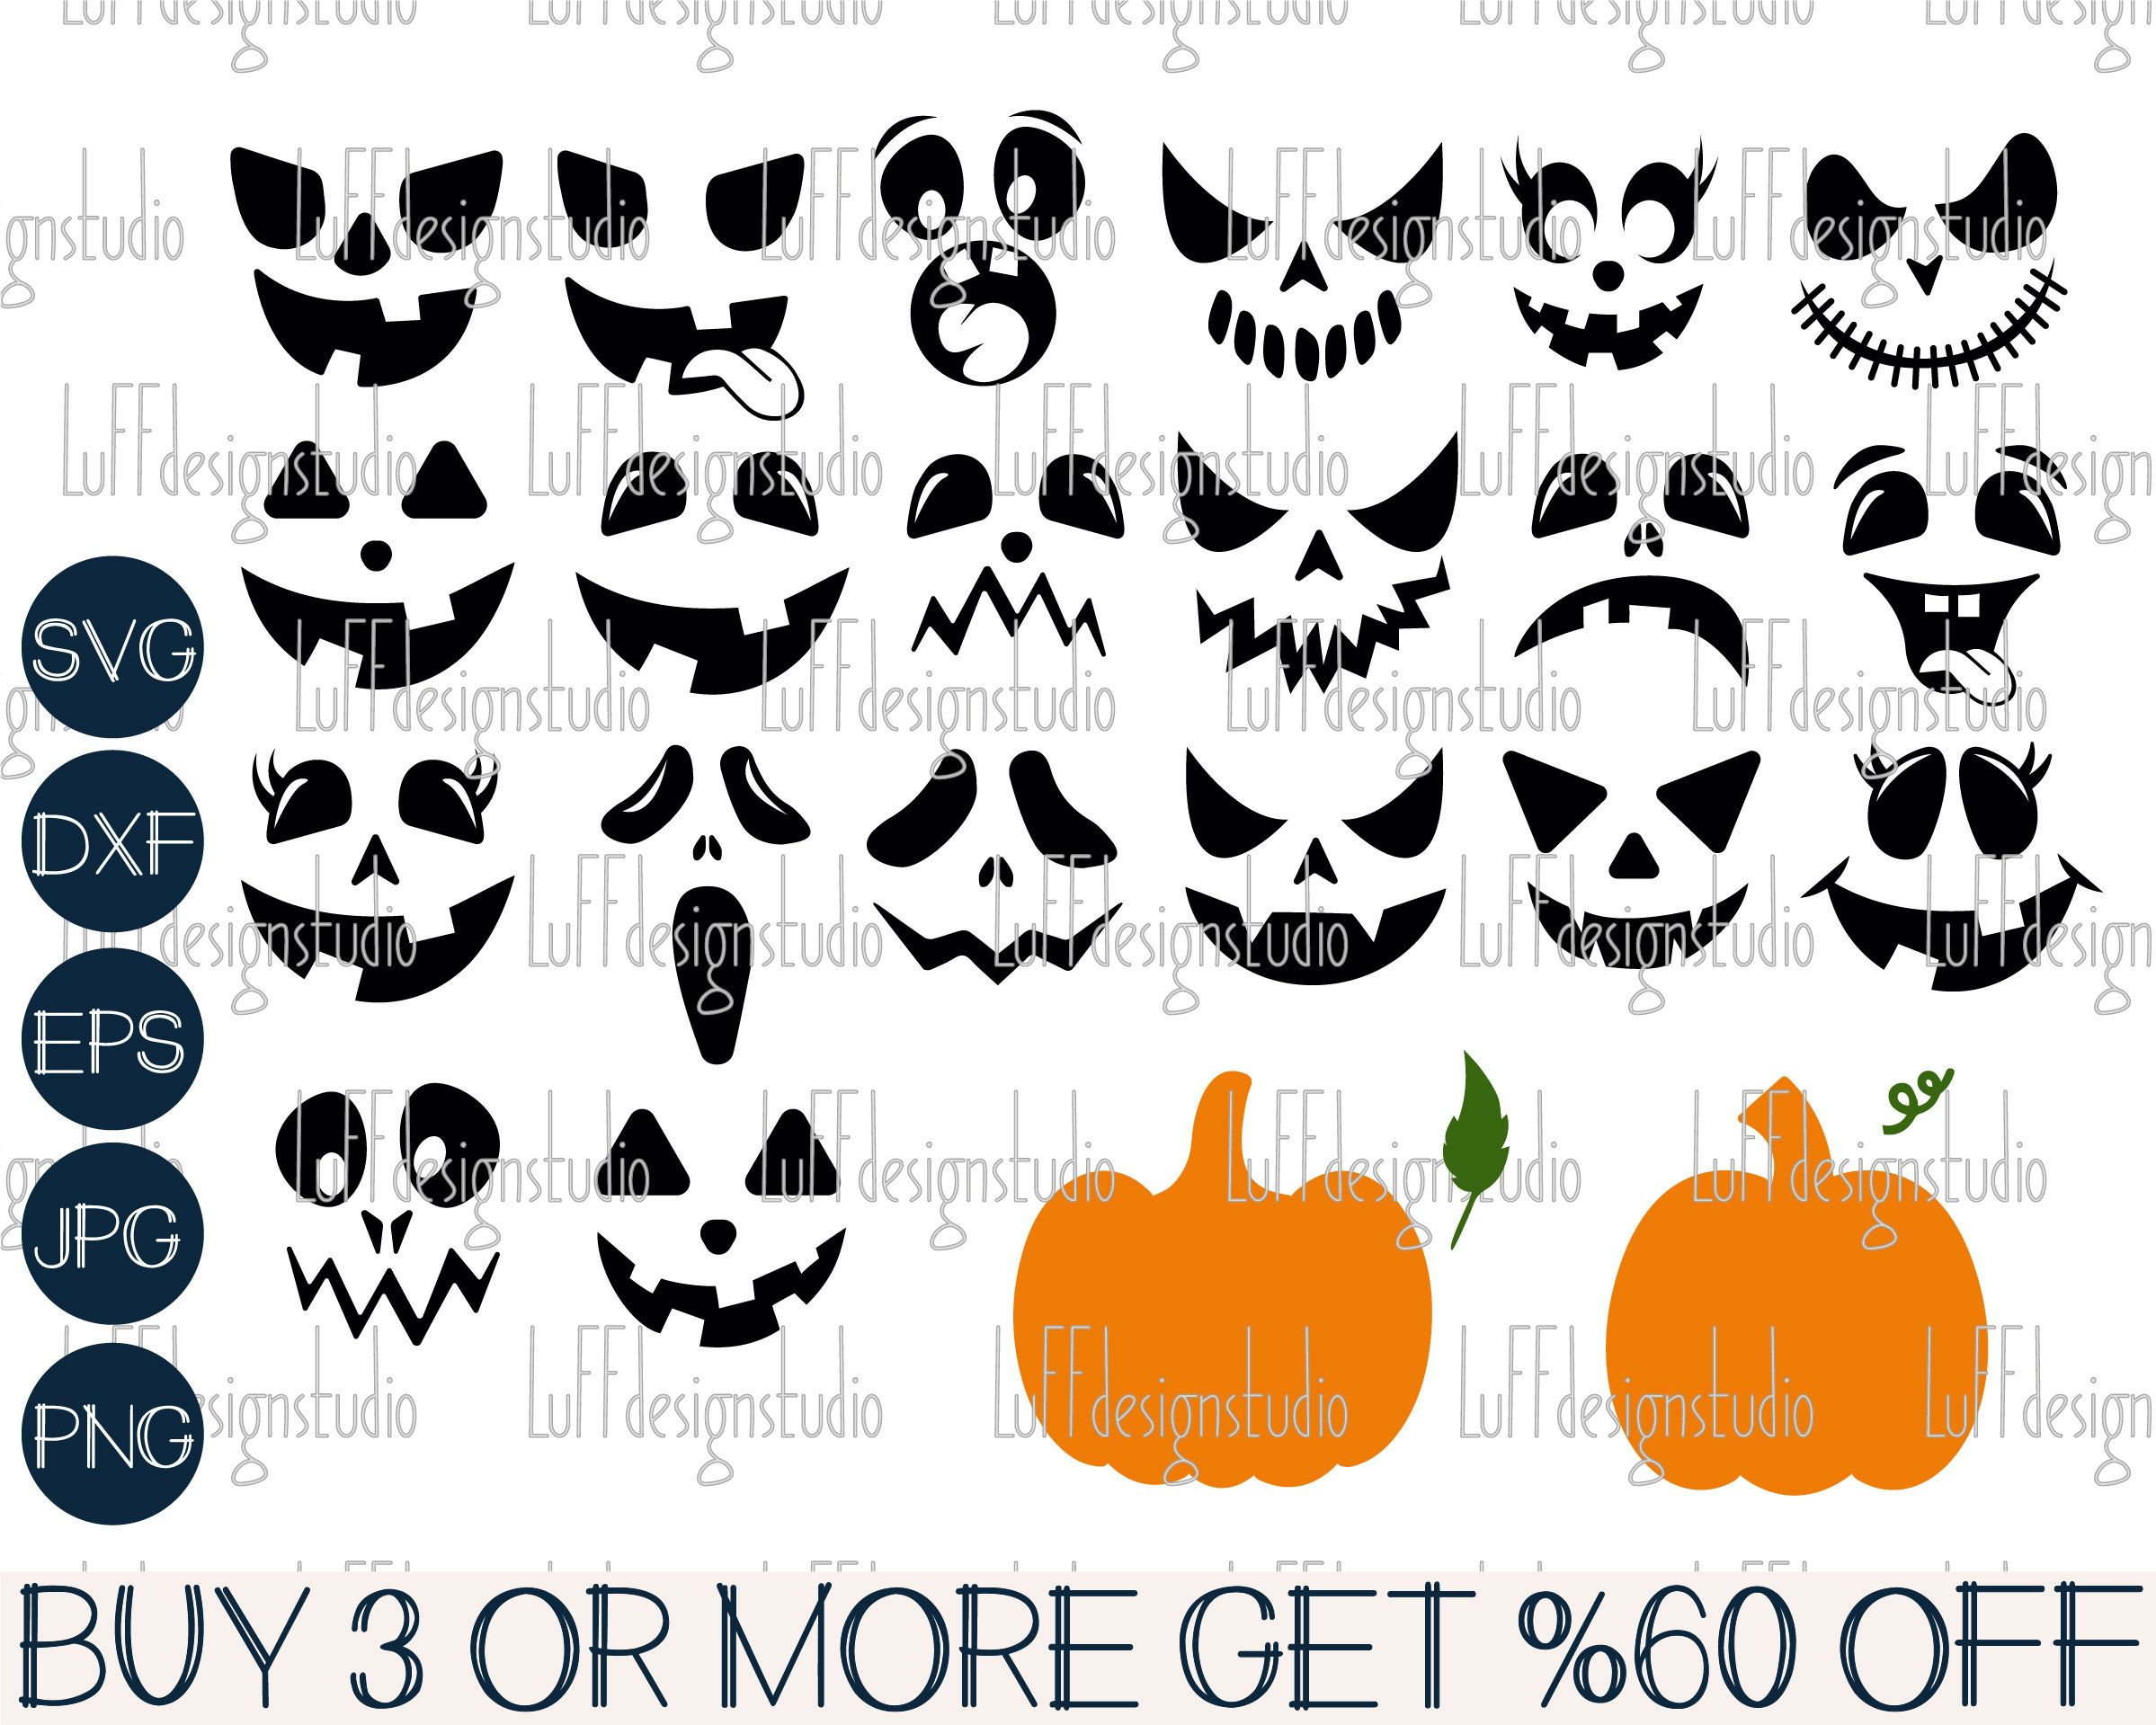 Pumpkin Face Svg Jack O Lantern Svg Pumpkin Faces Svg Halloween Svg Png Svg Files For Cricut Silhouette Sublimation Designs Downloads Pumpkin Faces Jack O Lantern Svg Files For Cricut